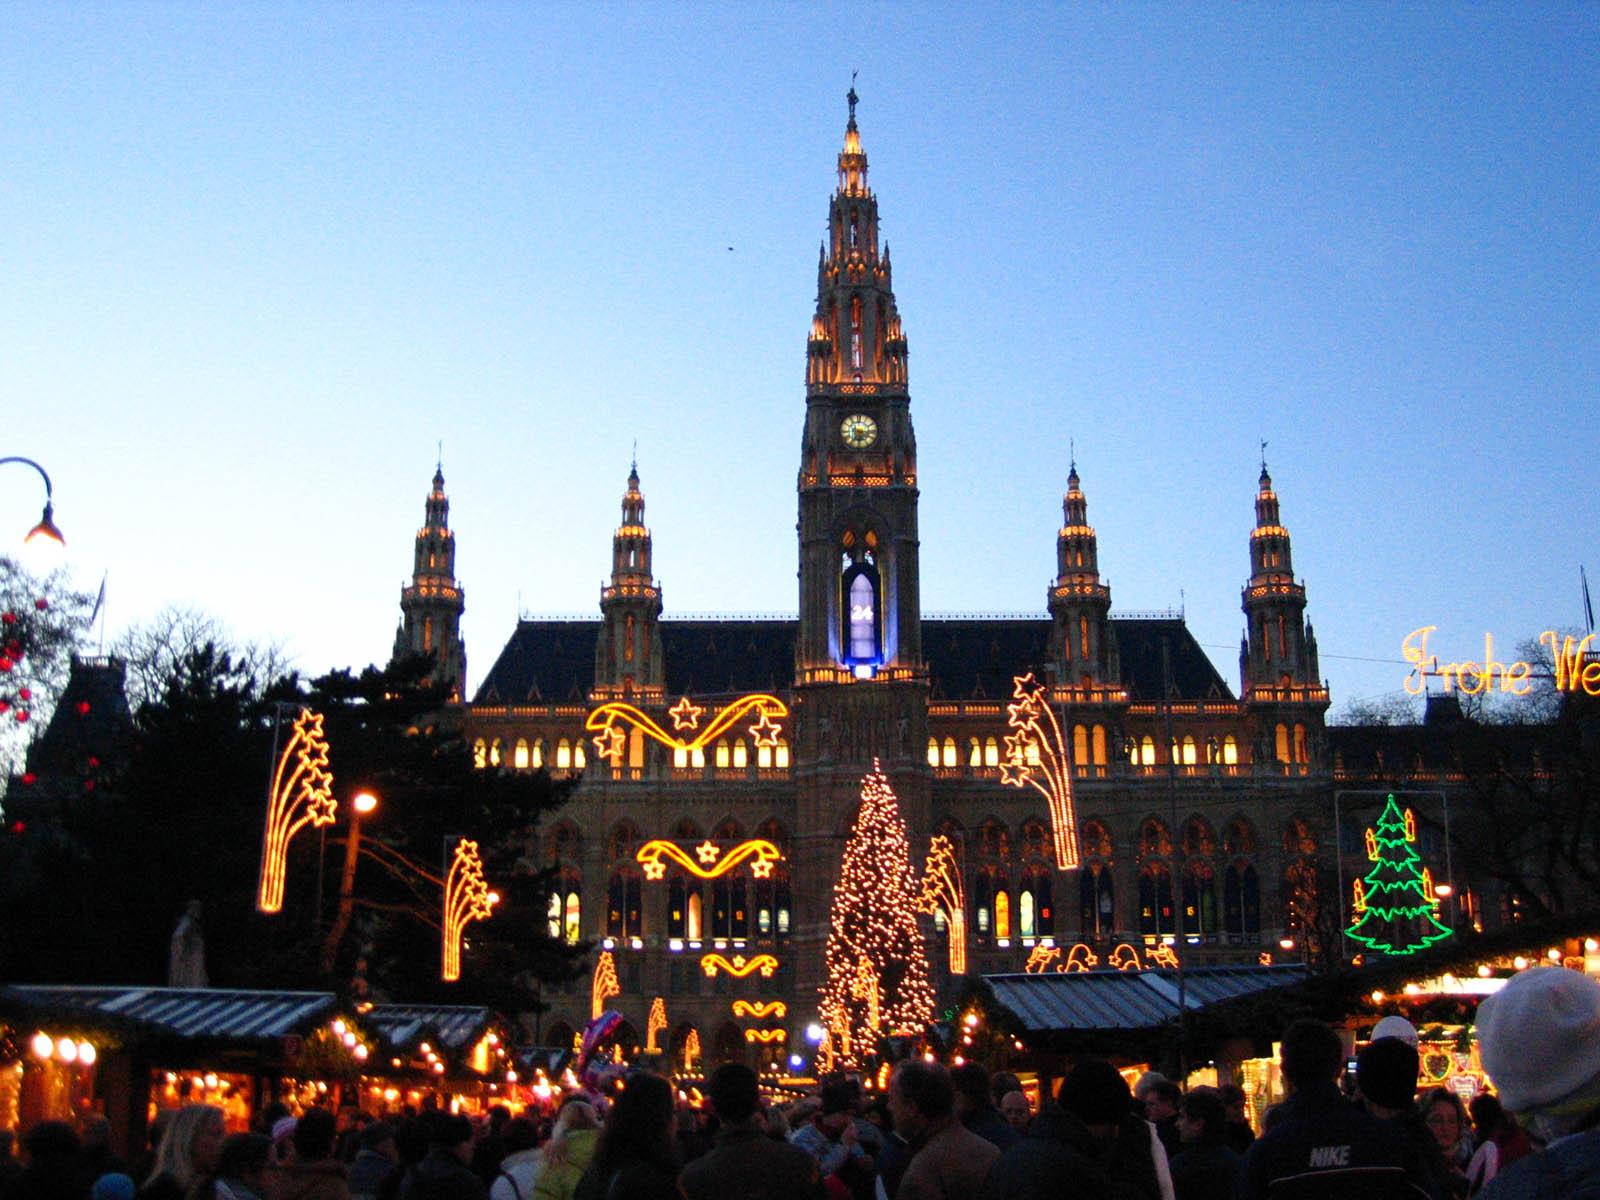 Mercatini_di_Natale_di_Vienna.jpg?1542967707